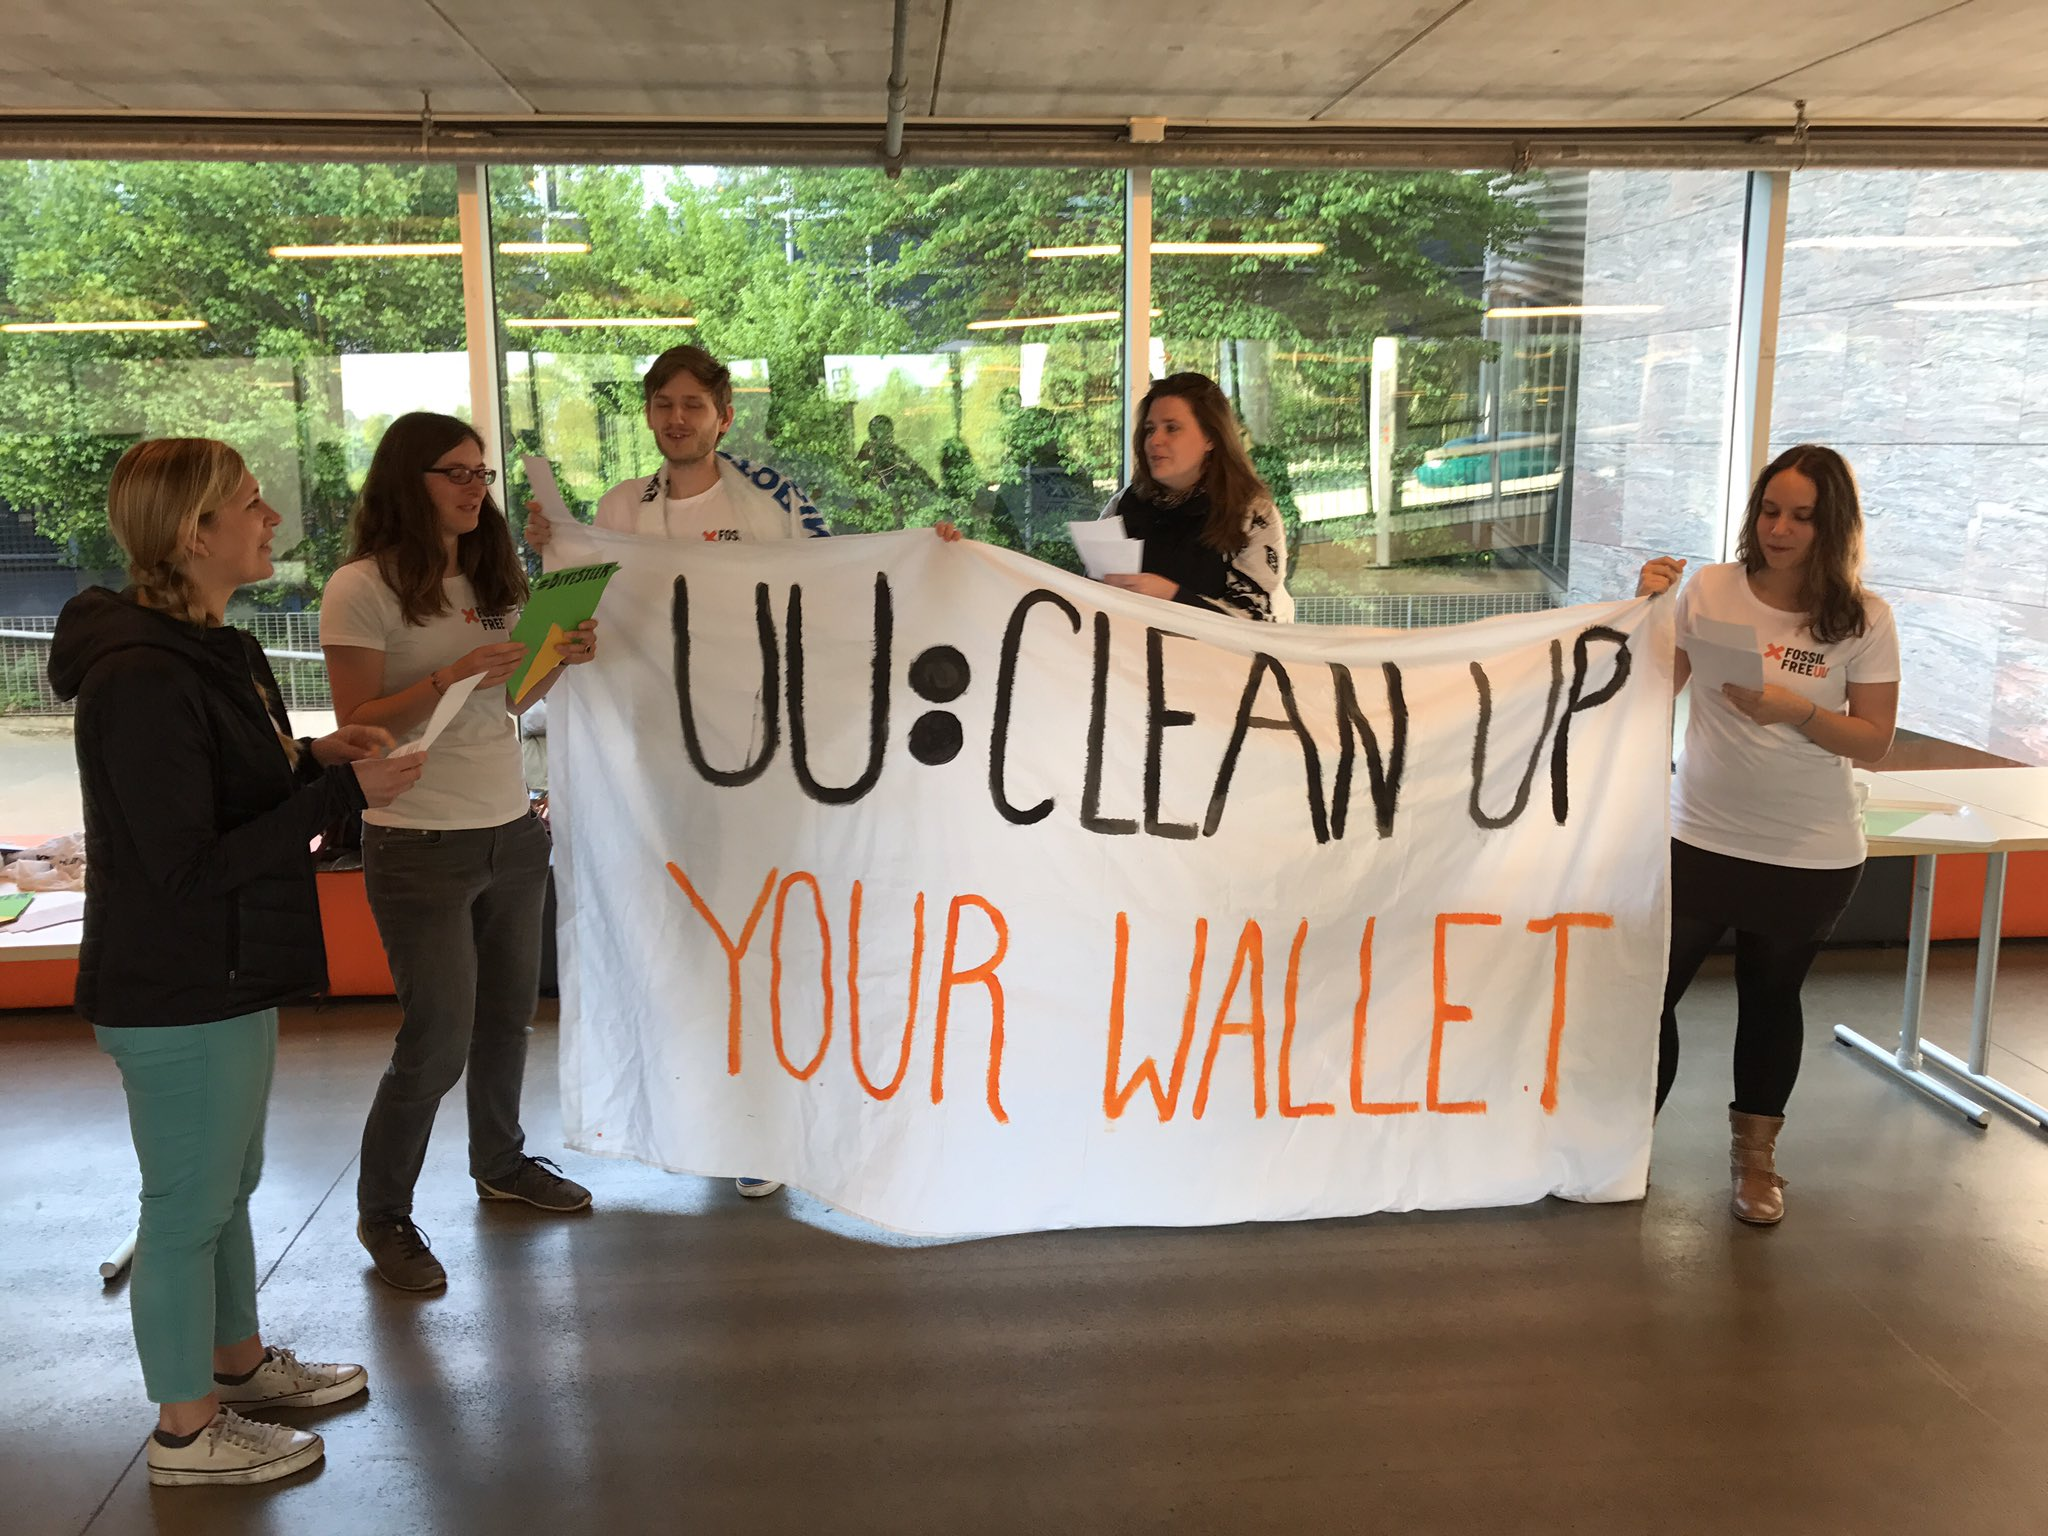 Global Divestment Mobilisation starting! @UtrechtUni #fossilfree https://t.co/DFv6G10LNm